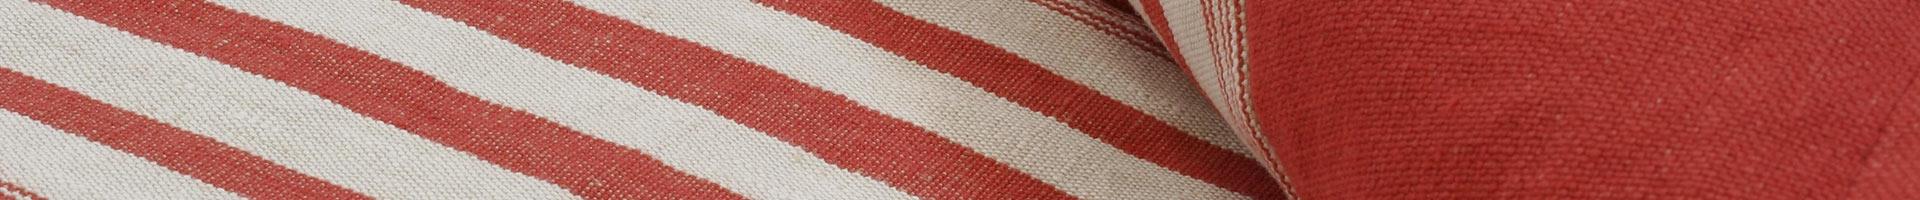 Bed runner in striped linen Maremma border in plain linen Maremma